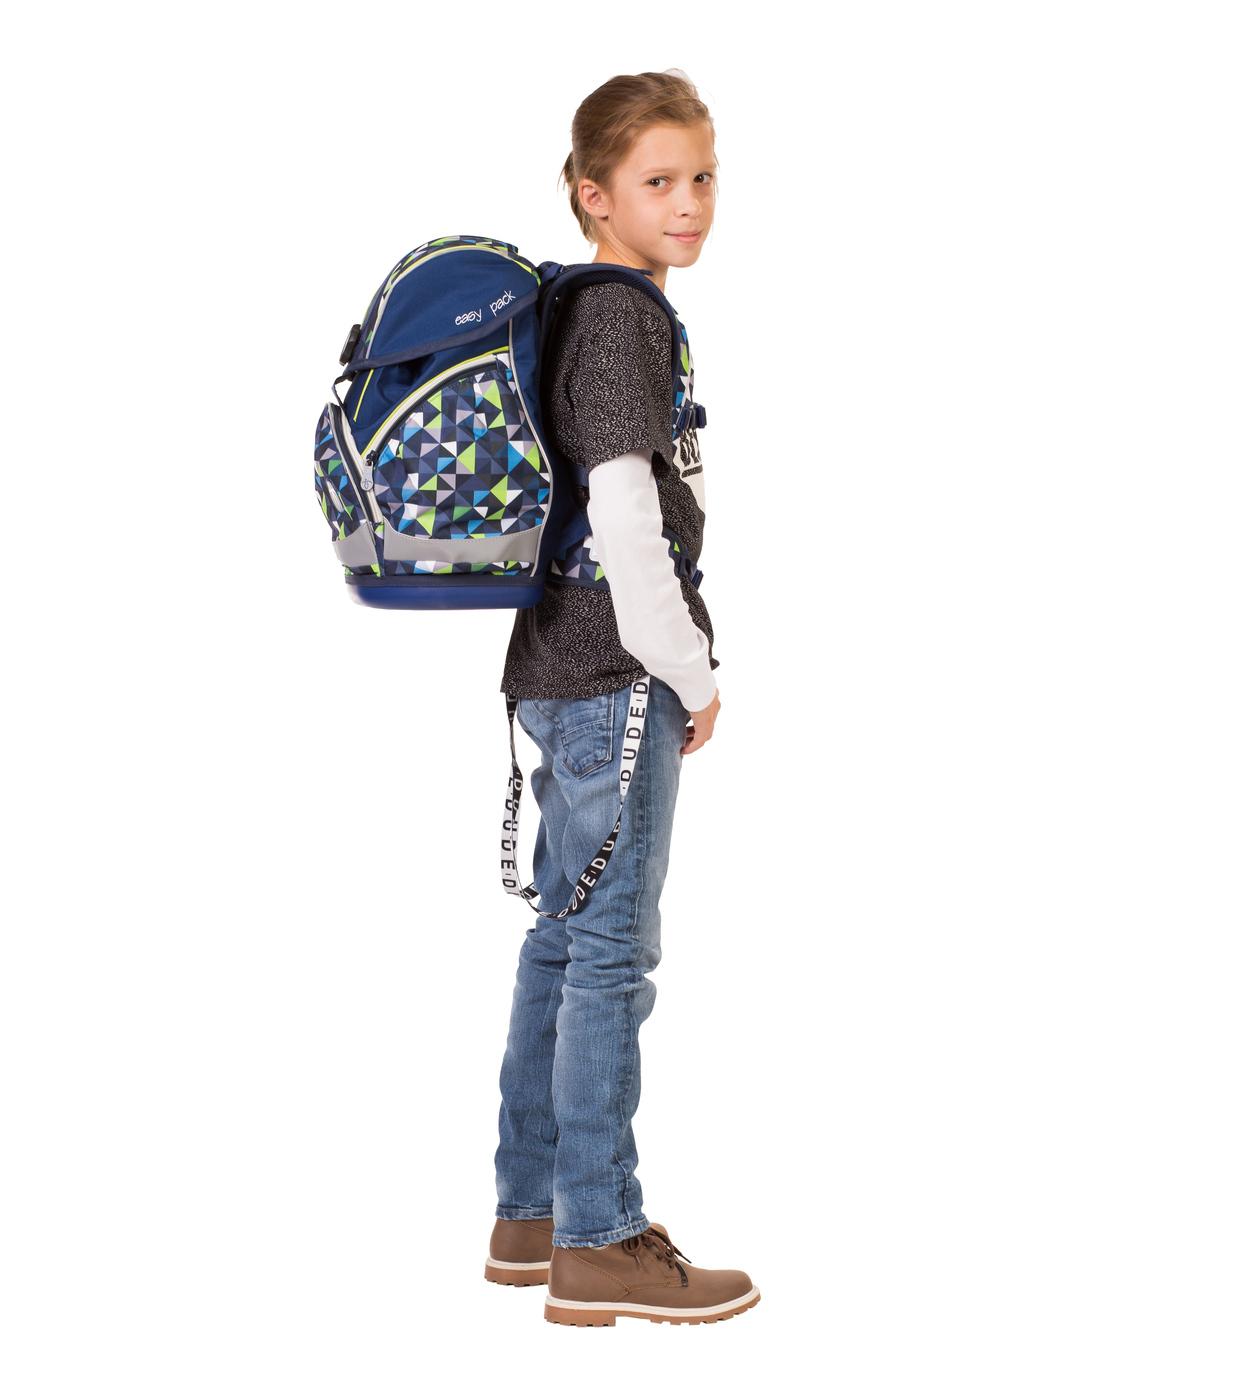 Ранец Belmil EASY PACK 404-40 BLUE PACK + мешок, - фото 16